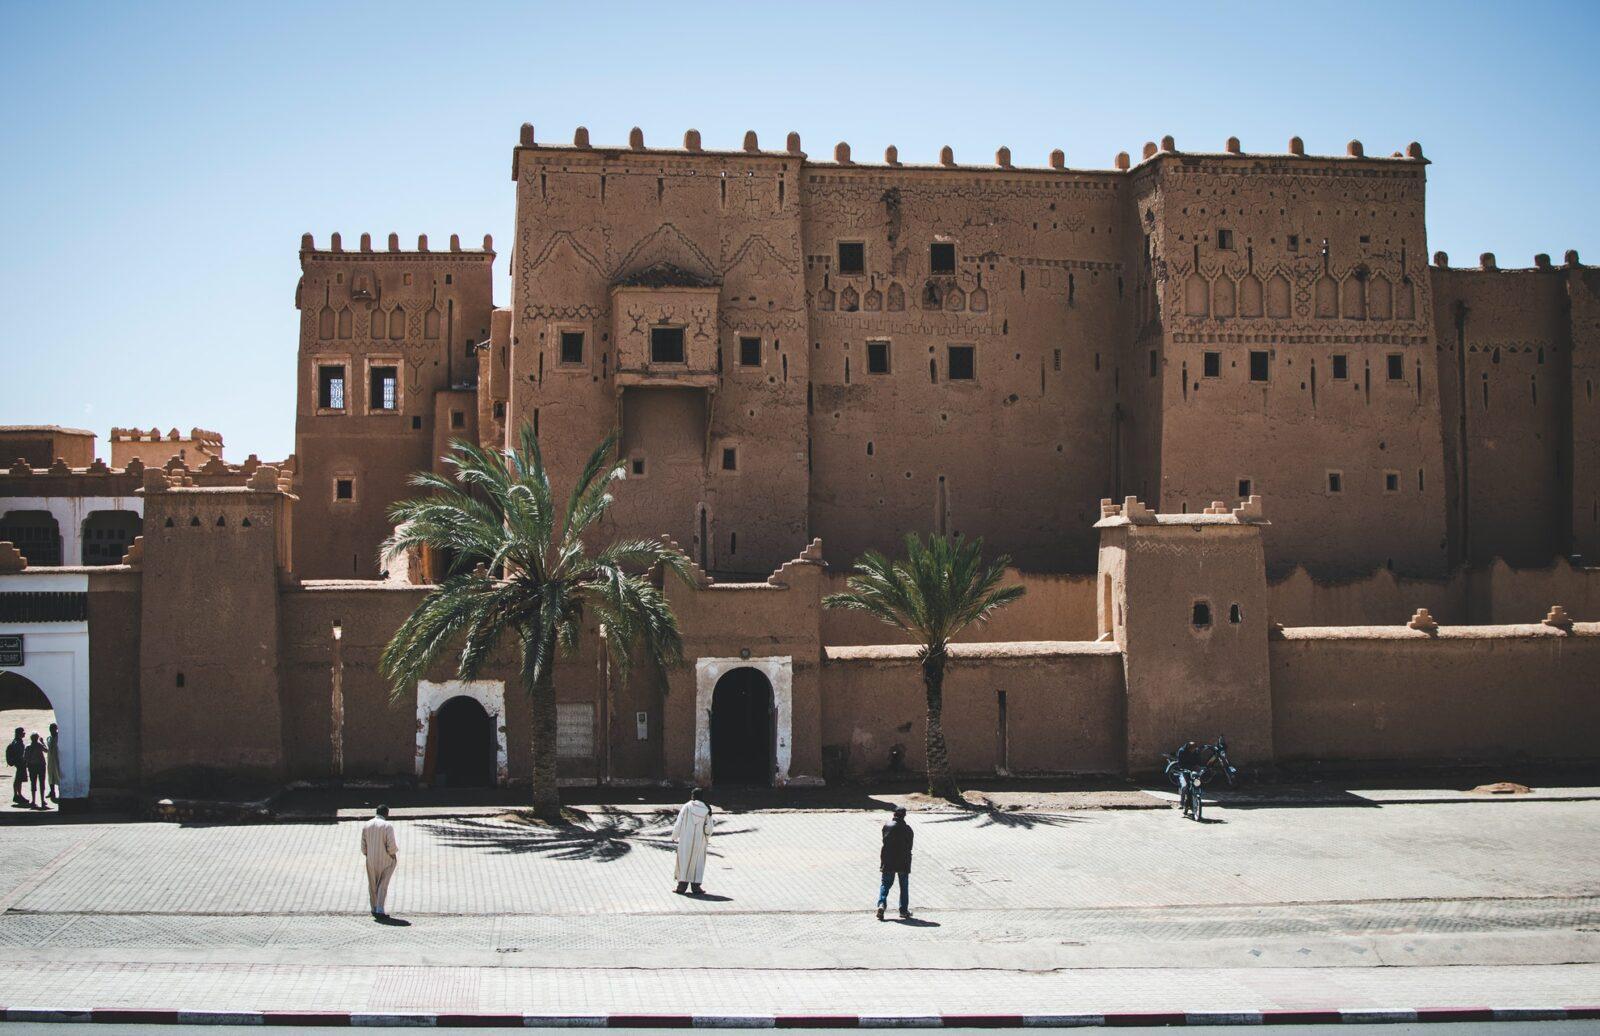 pexels nicolas postiglioni 943510 1536x995 - Guide Morocco Tours